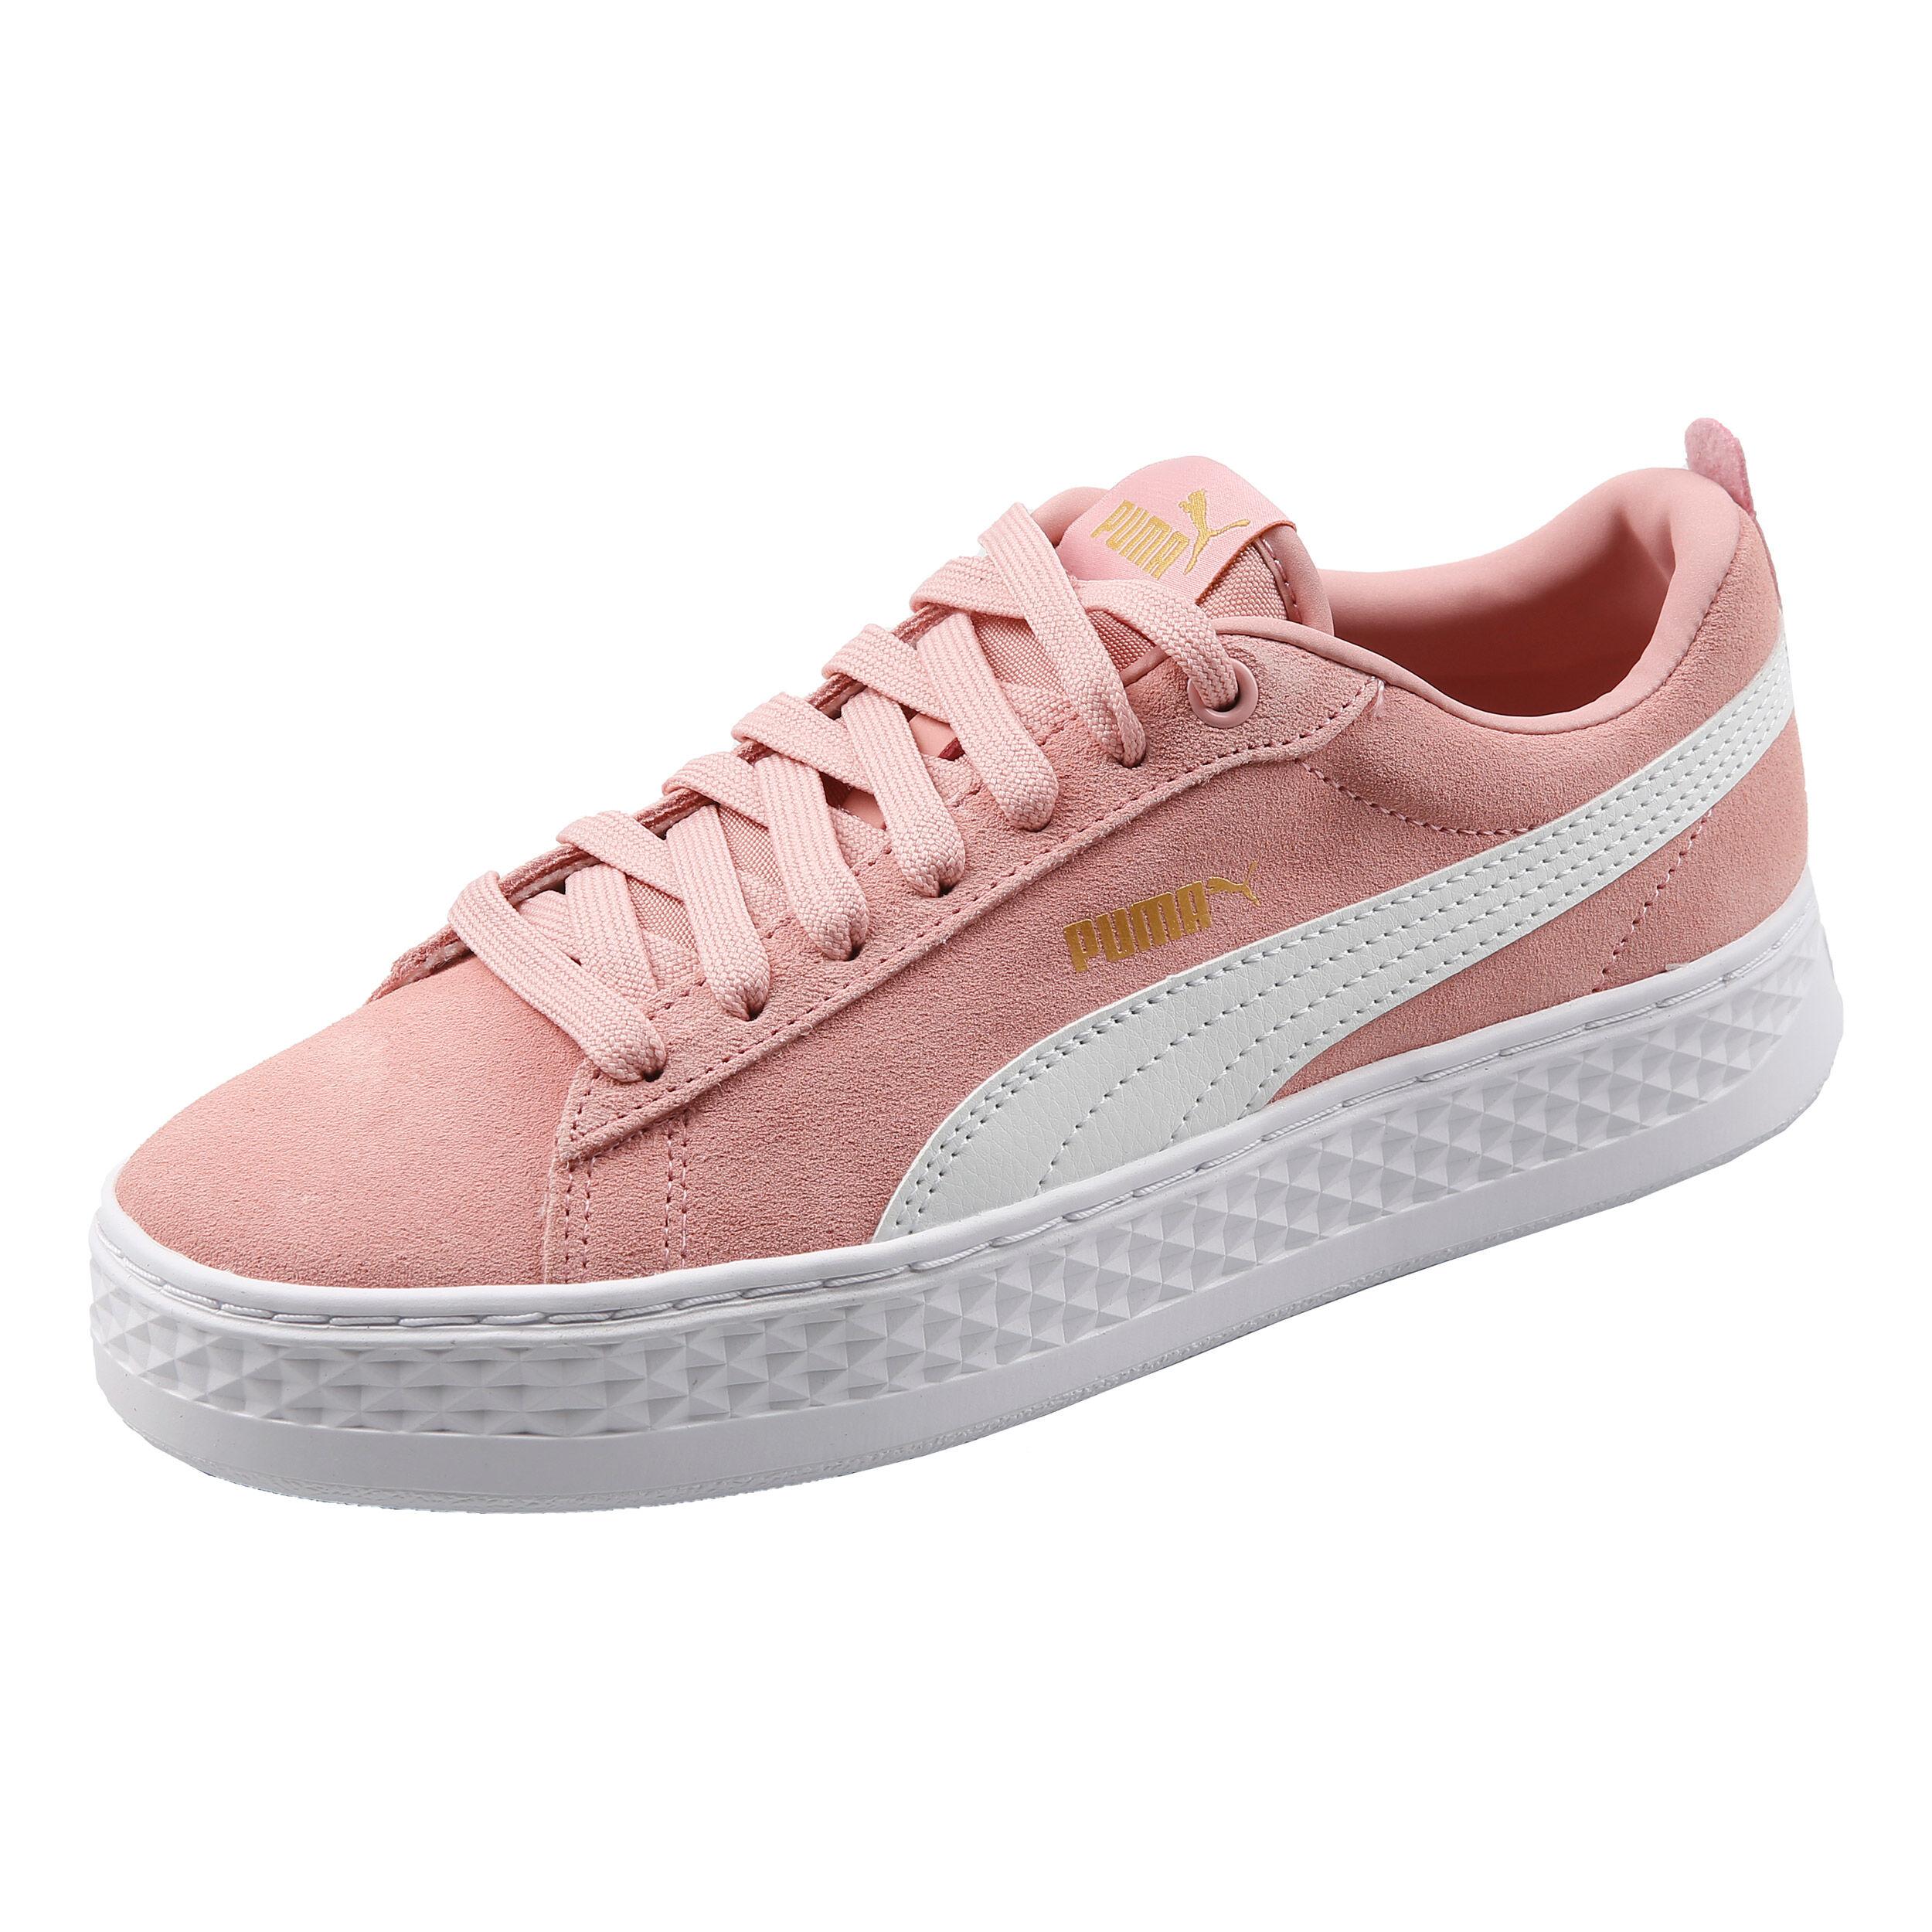 Puma Smash Platform SD Sneaker Damen Rosa, Weiß online